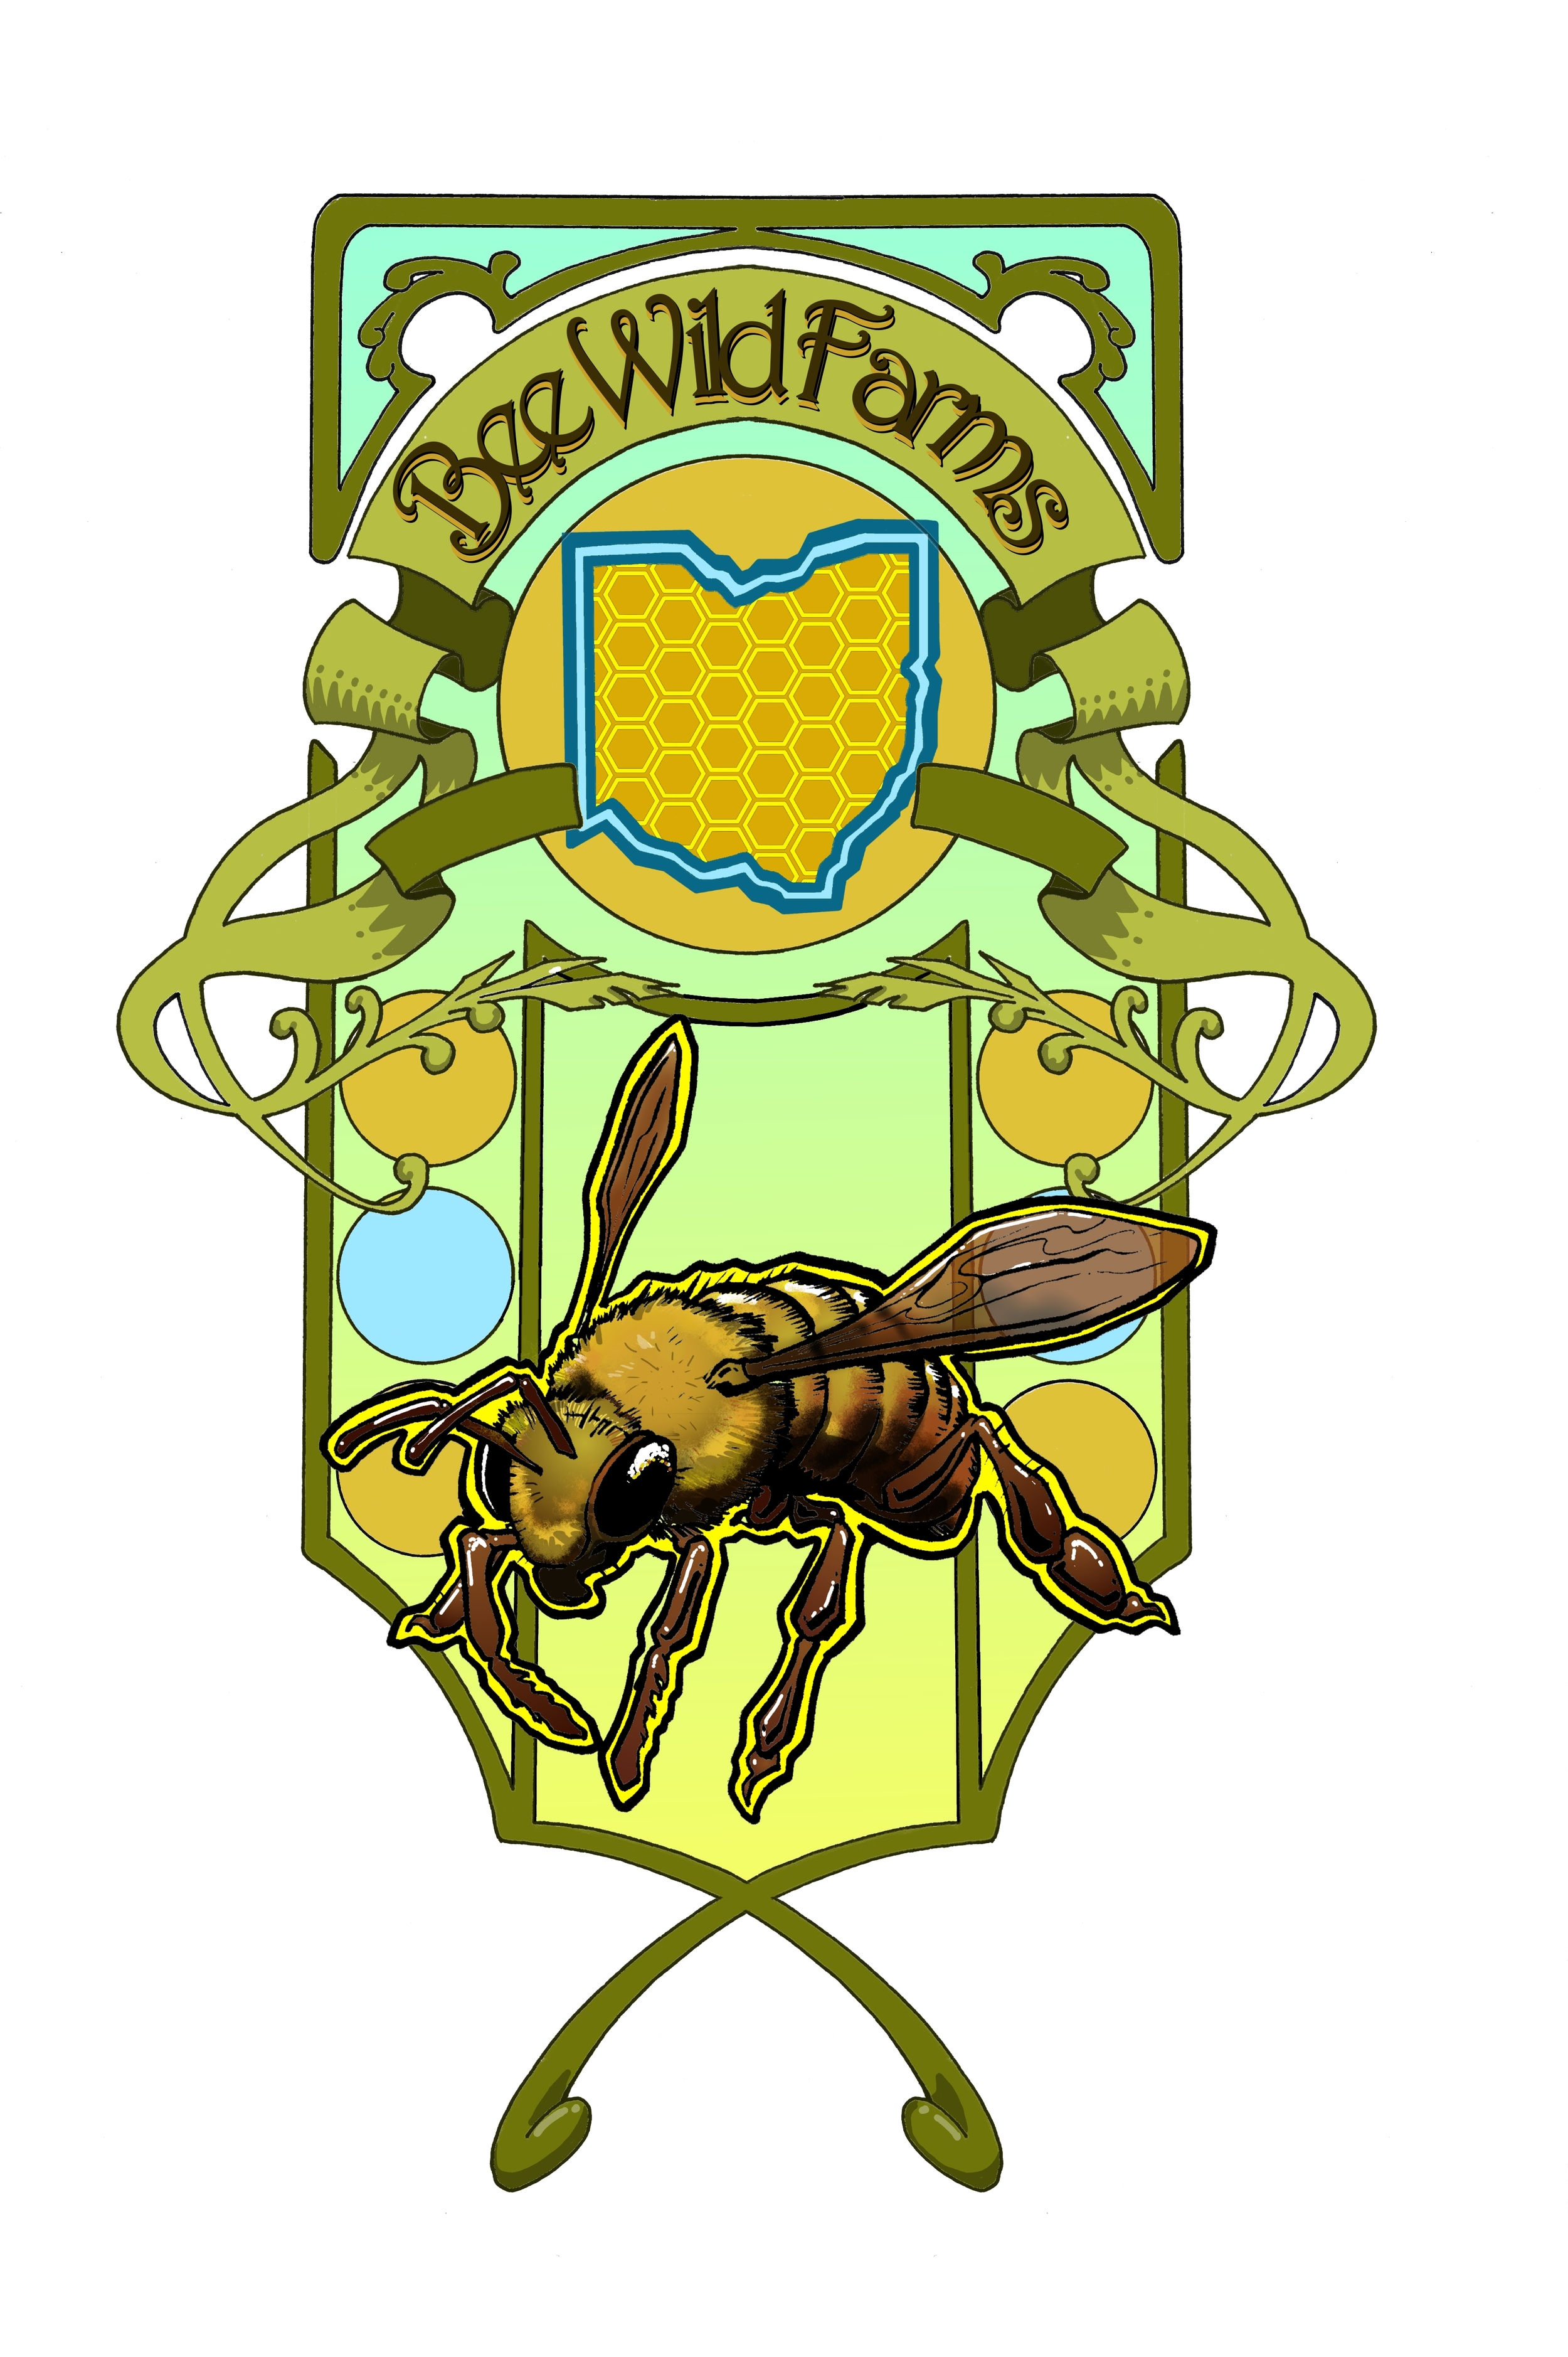 Bee Wild Farms